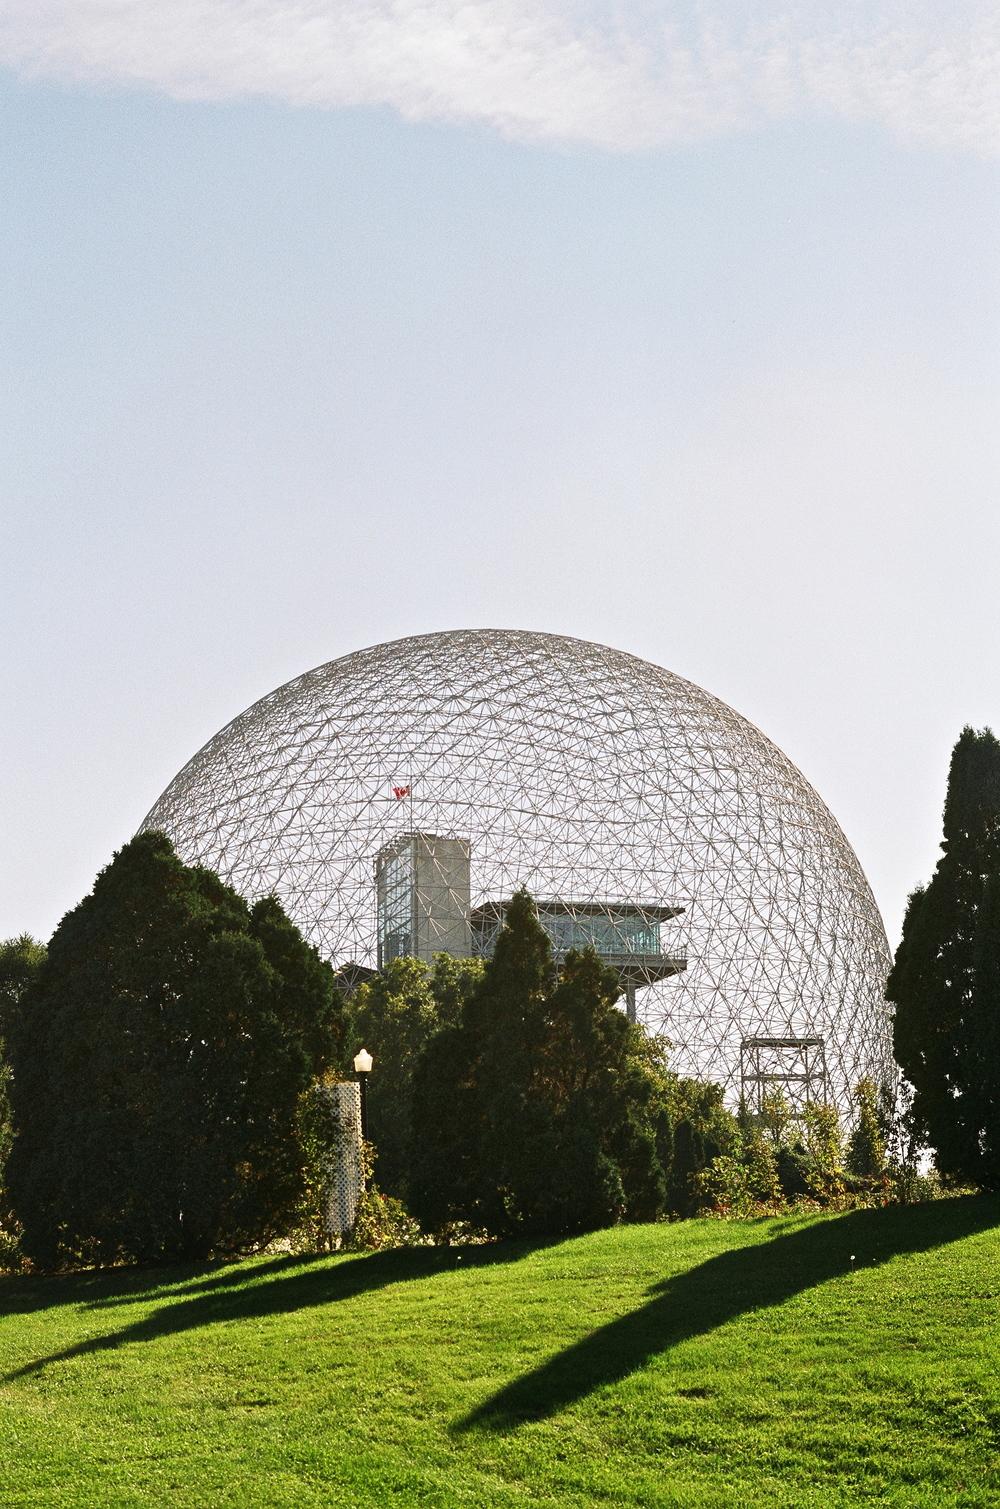 Biosphère, Montreal, 2014